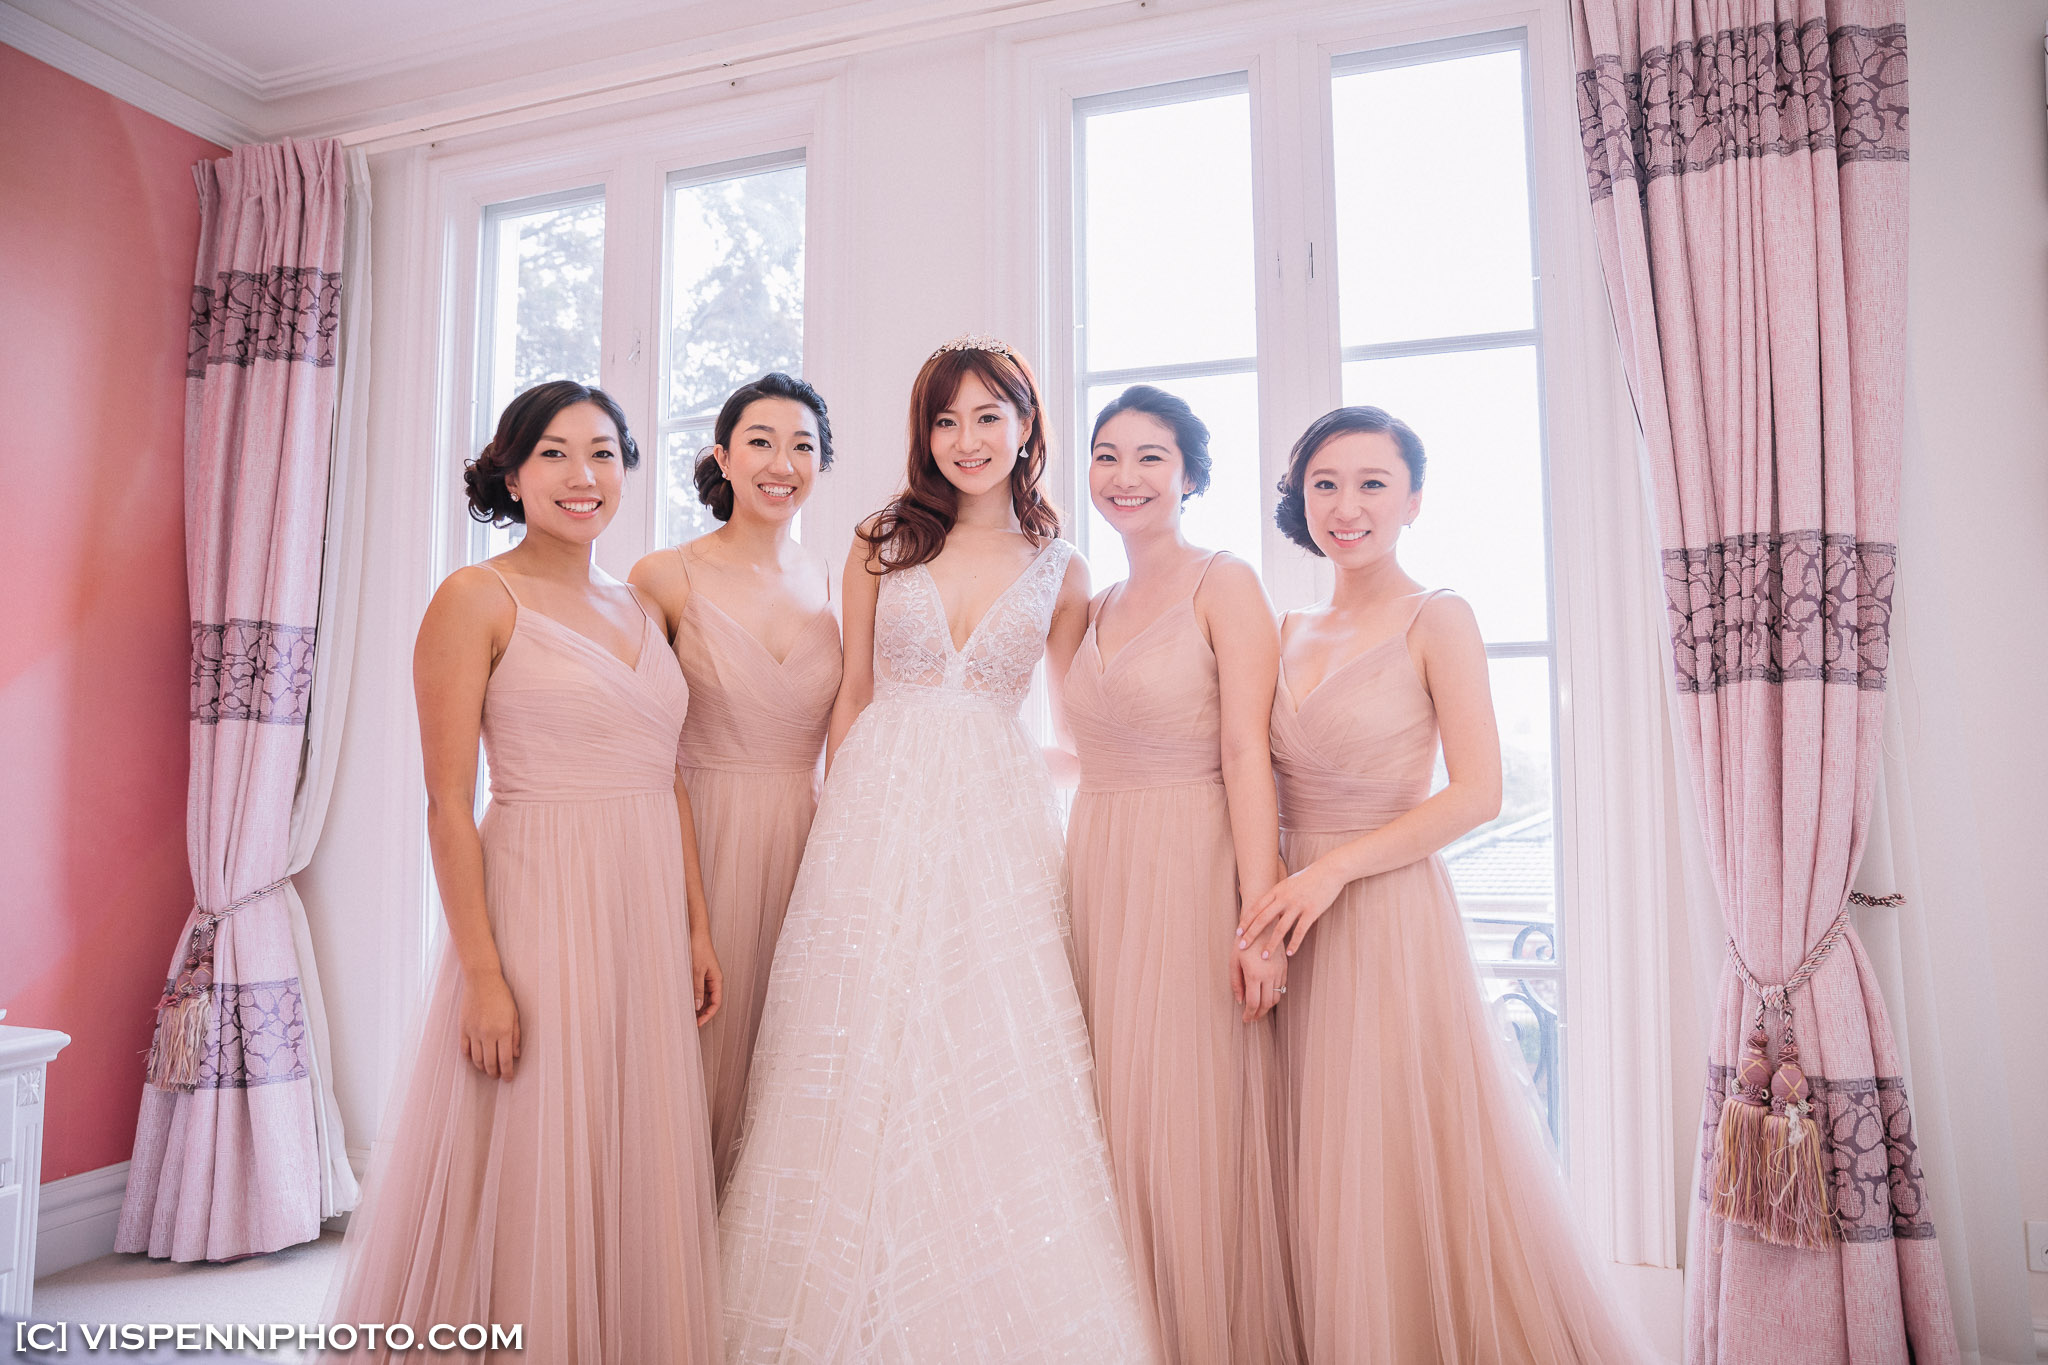 WEDDING DAY Photography Melbourne VISPENN 墨尔本 婚礼跟拍 婚礼摄像 婚礼摄影 结婚照 登记照 VISPENN 0051 5D4 1658